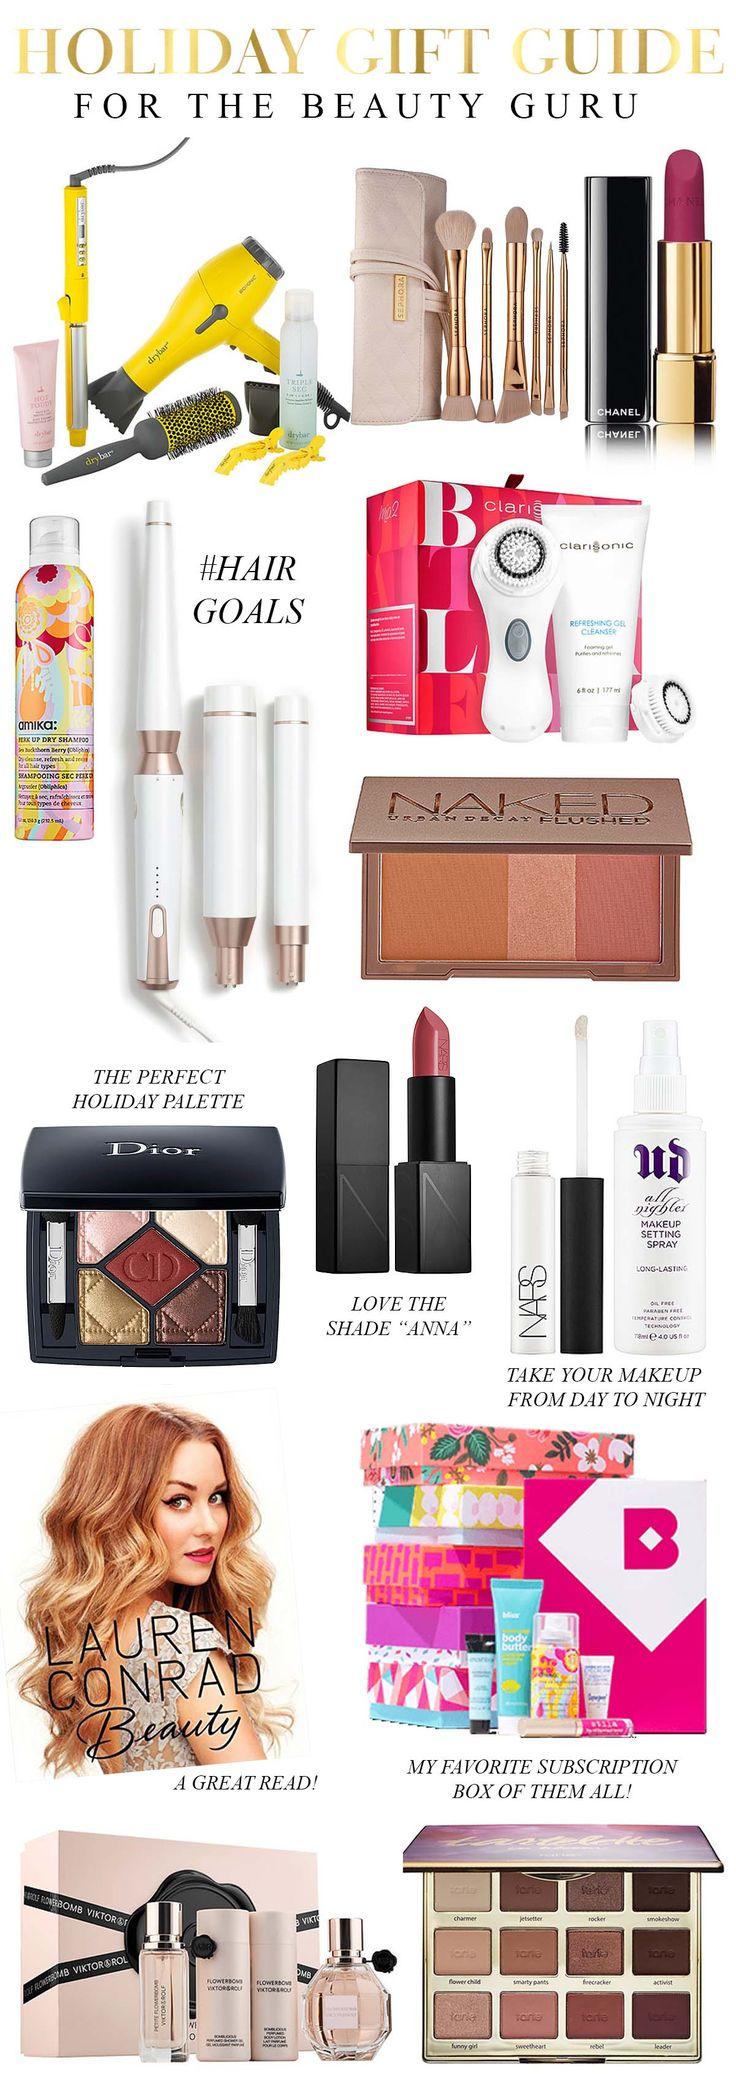 Gift Guide for the Beauty Guru // haveawesleyday.com